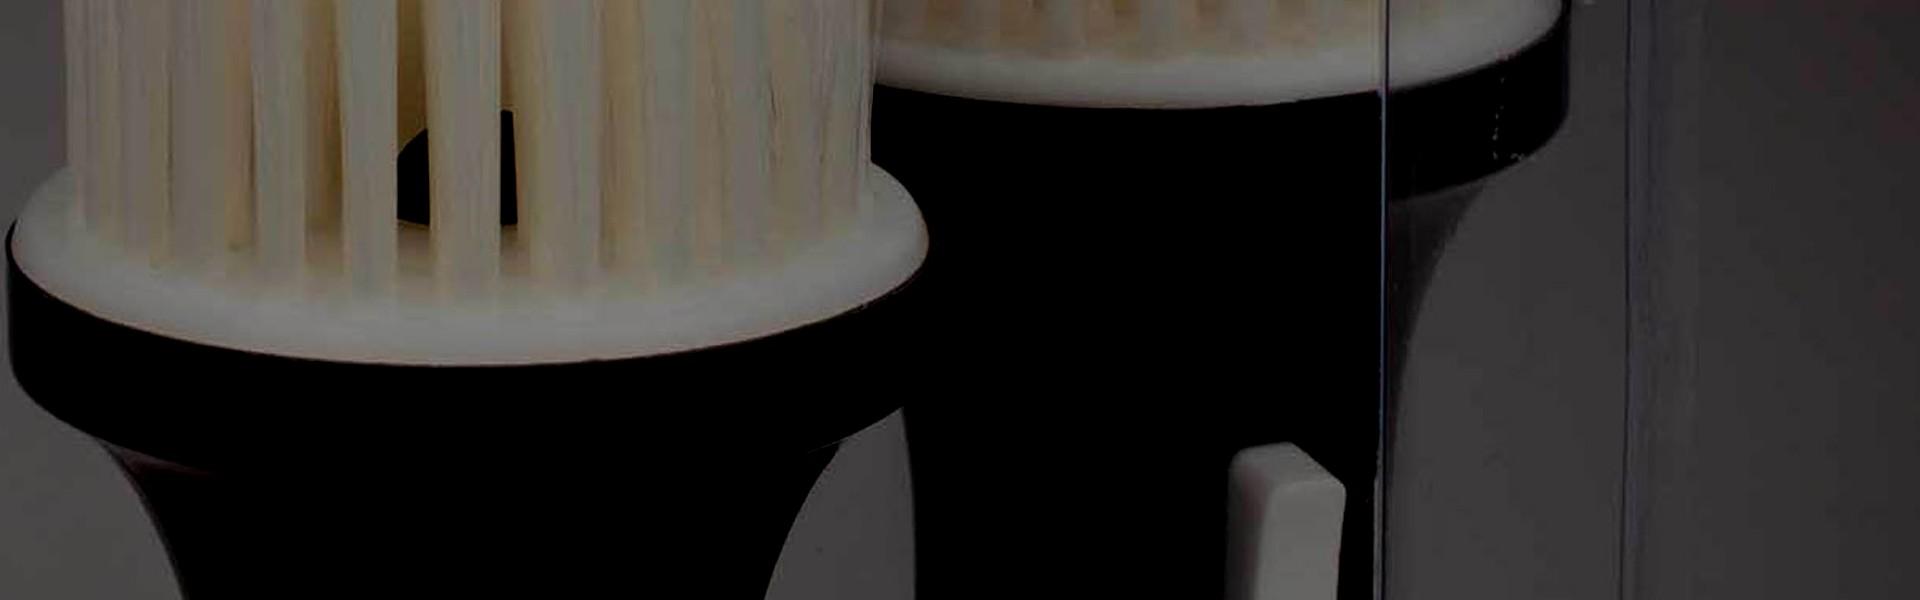 Pennellesse cacciapeli minuteria parrucchiere